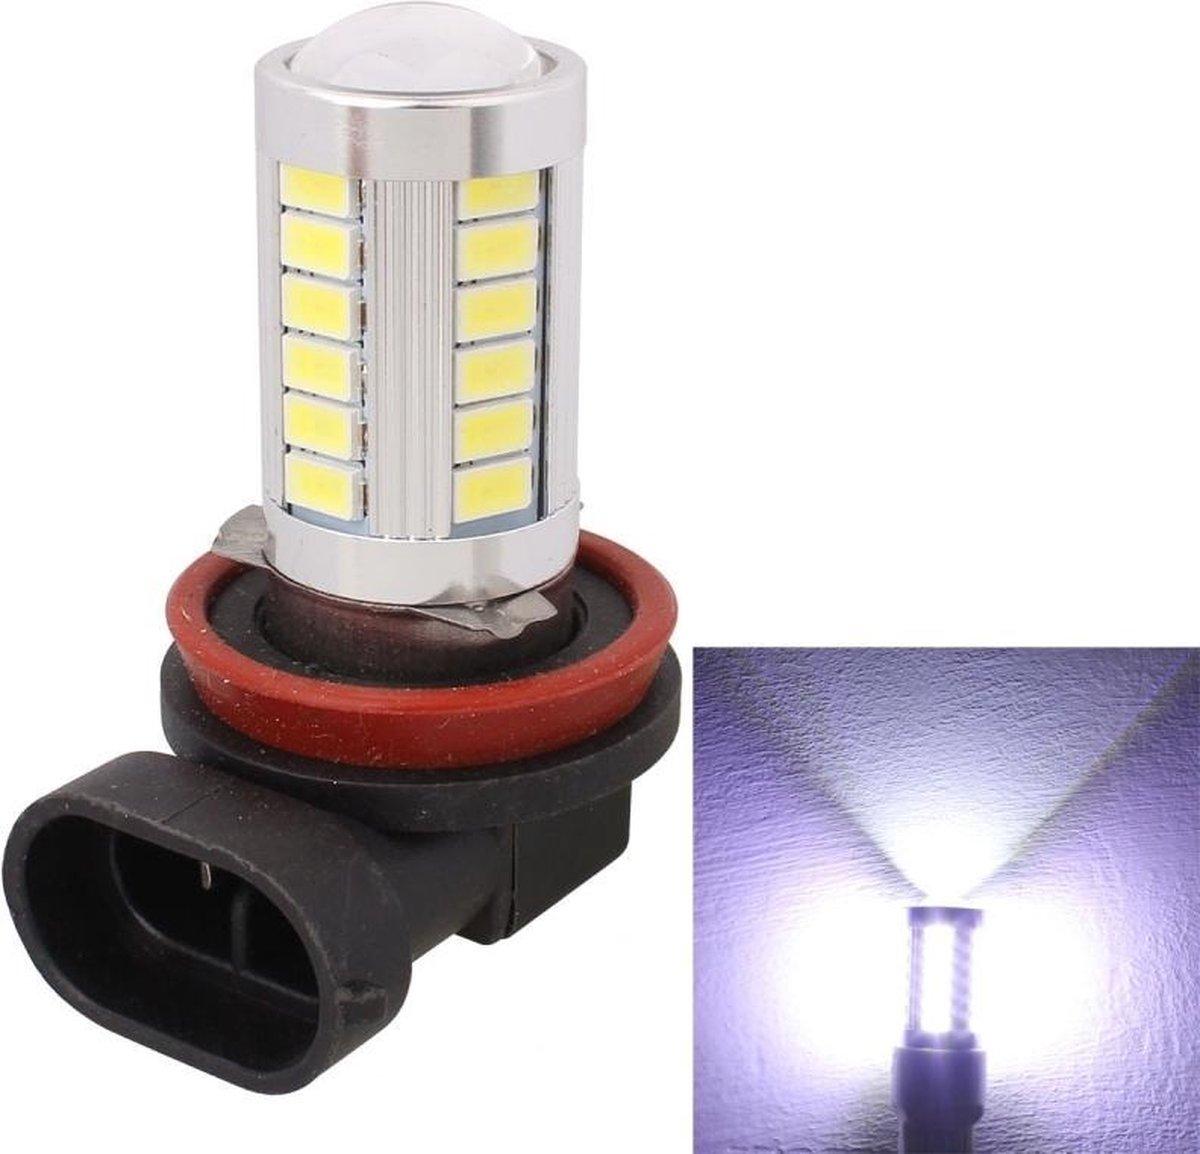 5630 LED SMD auto mistlamp - H8/H11 Fitting - 2 stuks